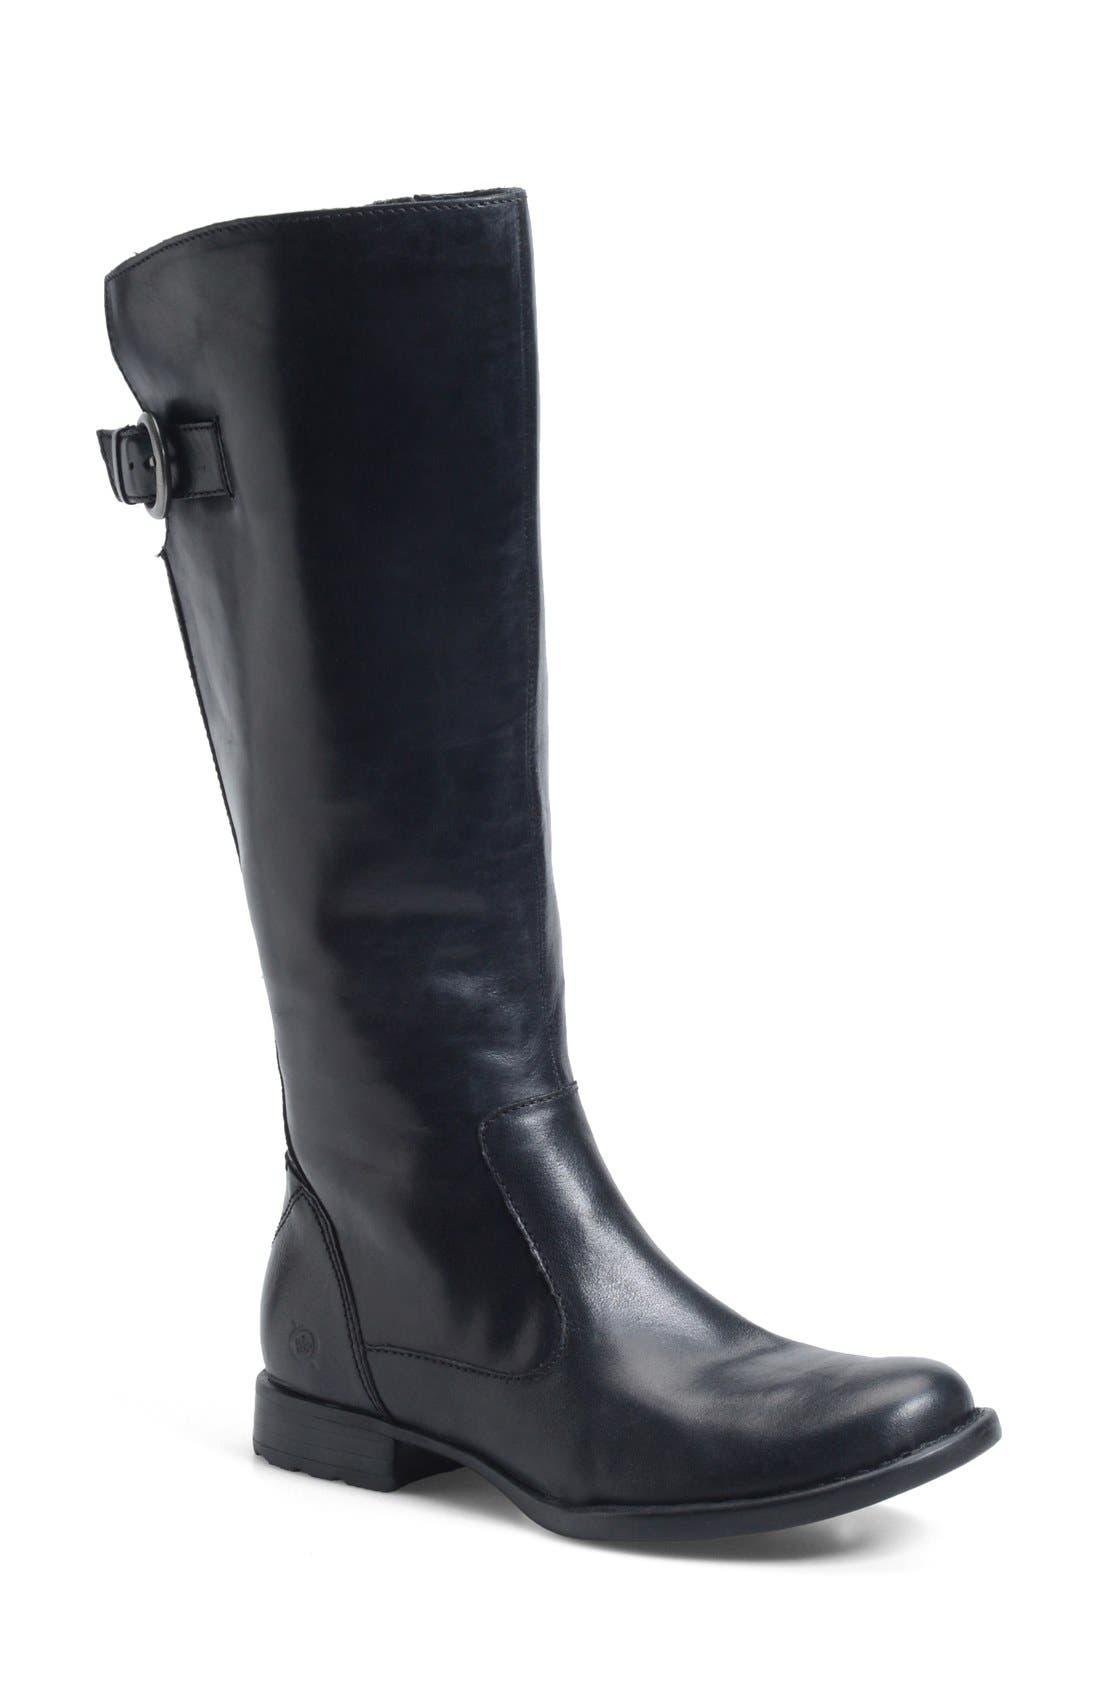 Alternate Image 1 Selected - Børn 'Lottie' Round Toe Boot (Women)